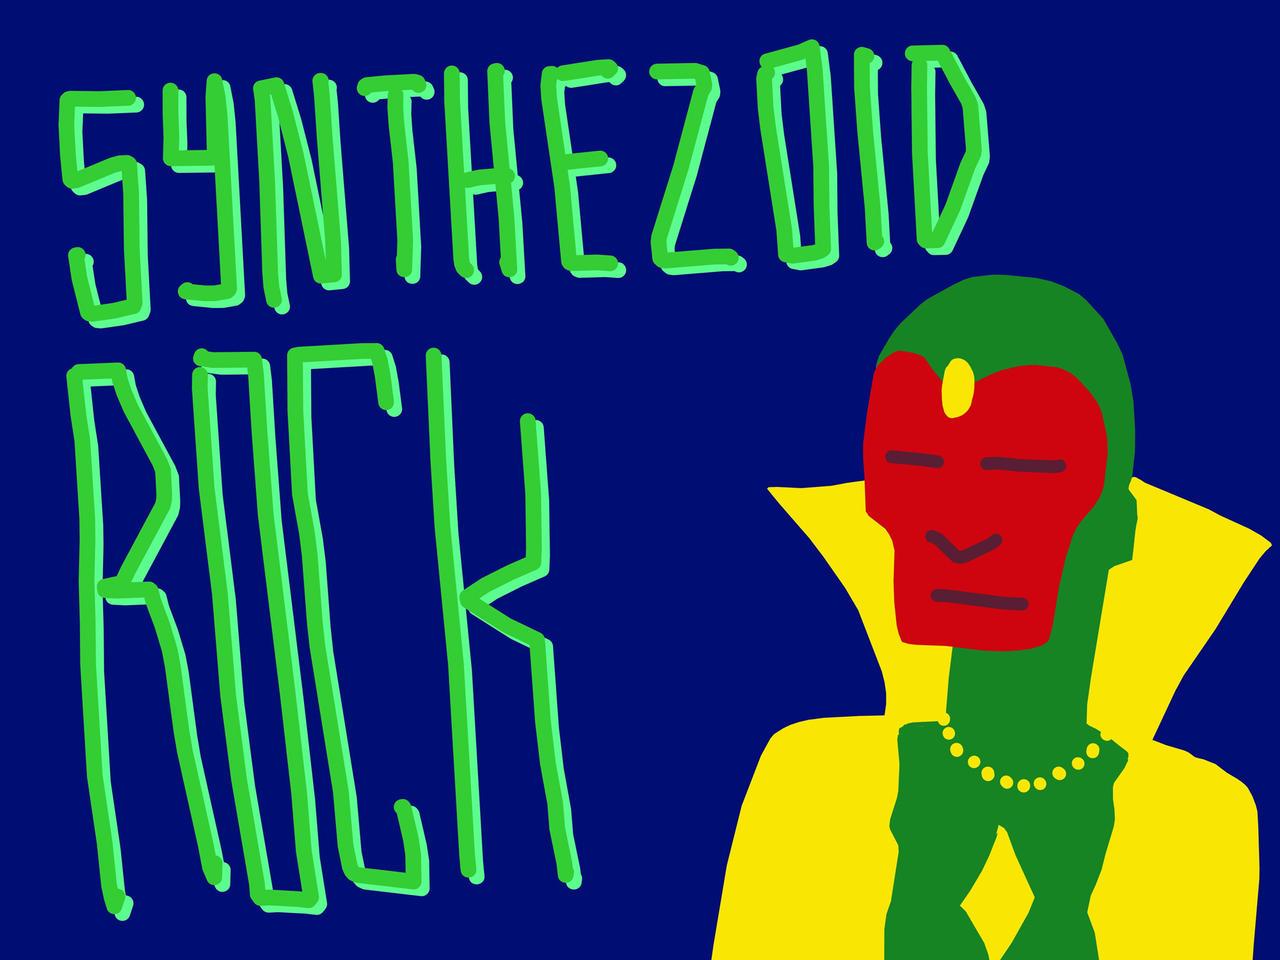 Synthezoid Rock - 7 Star Sky Flash Kick